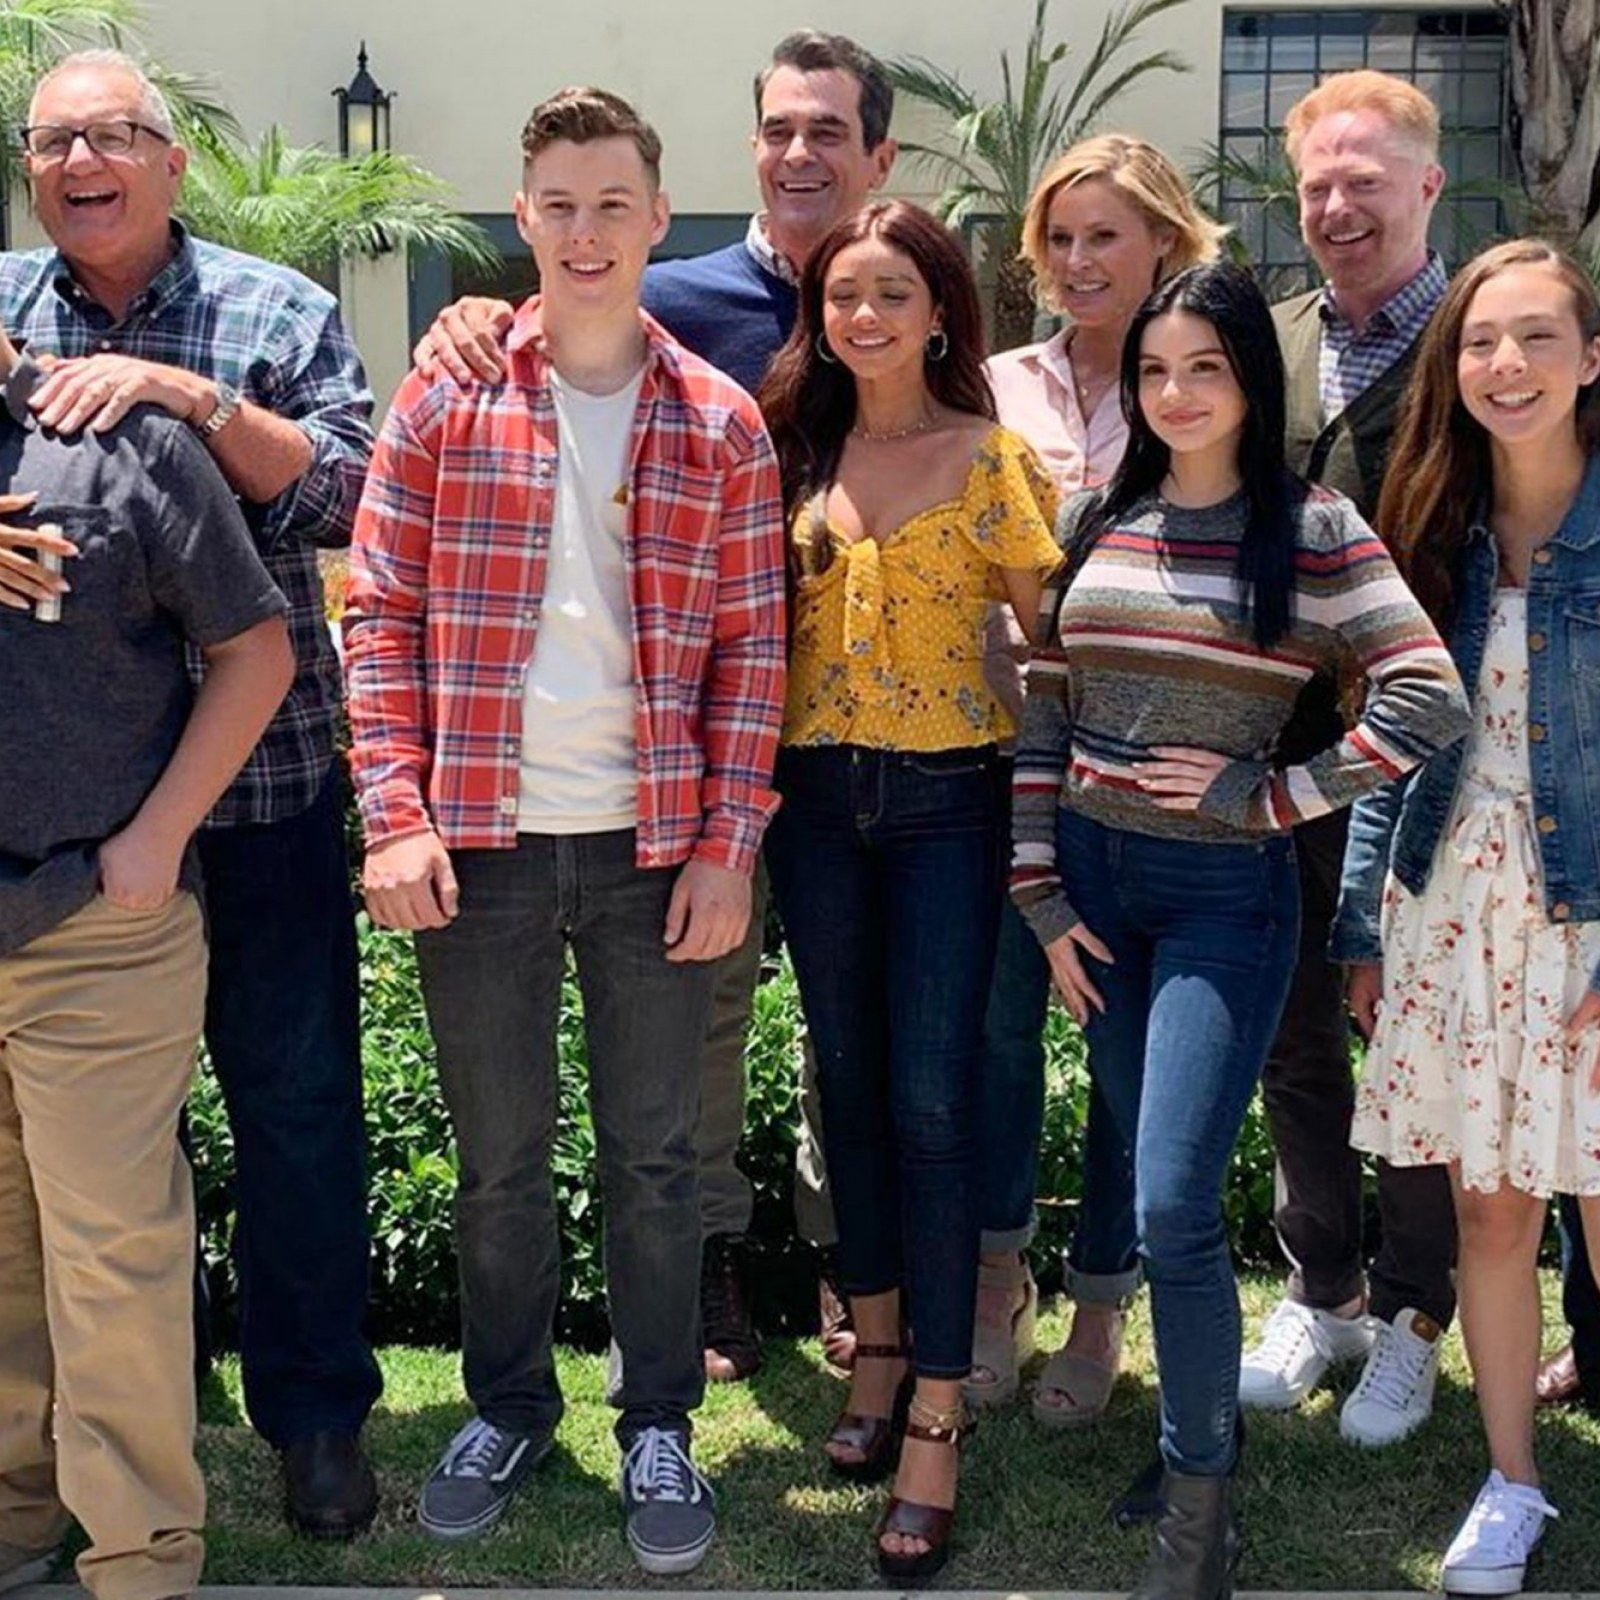 modern family season 10 stream free online